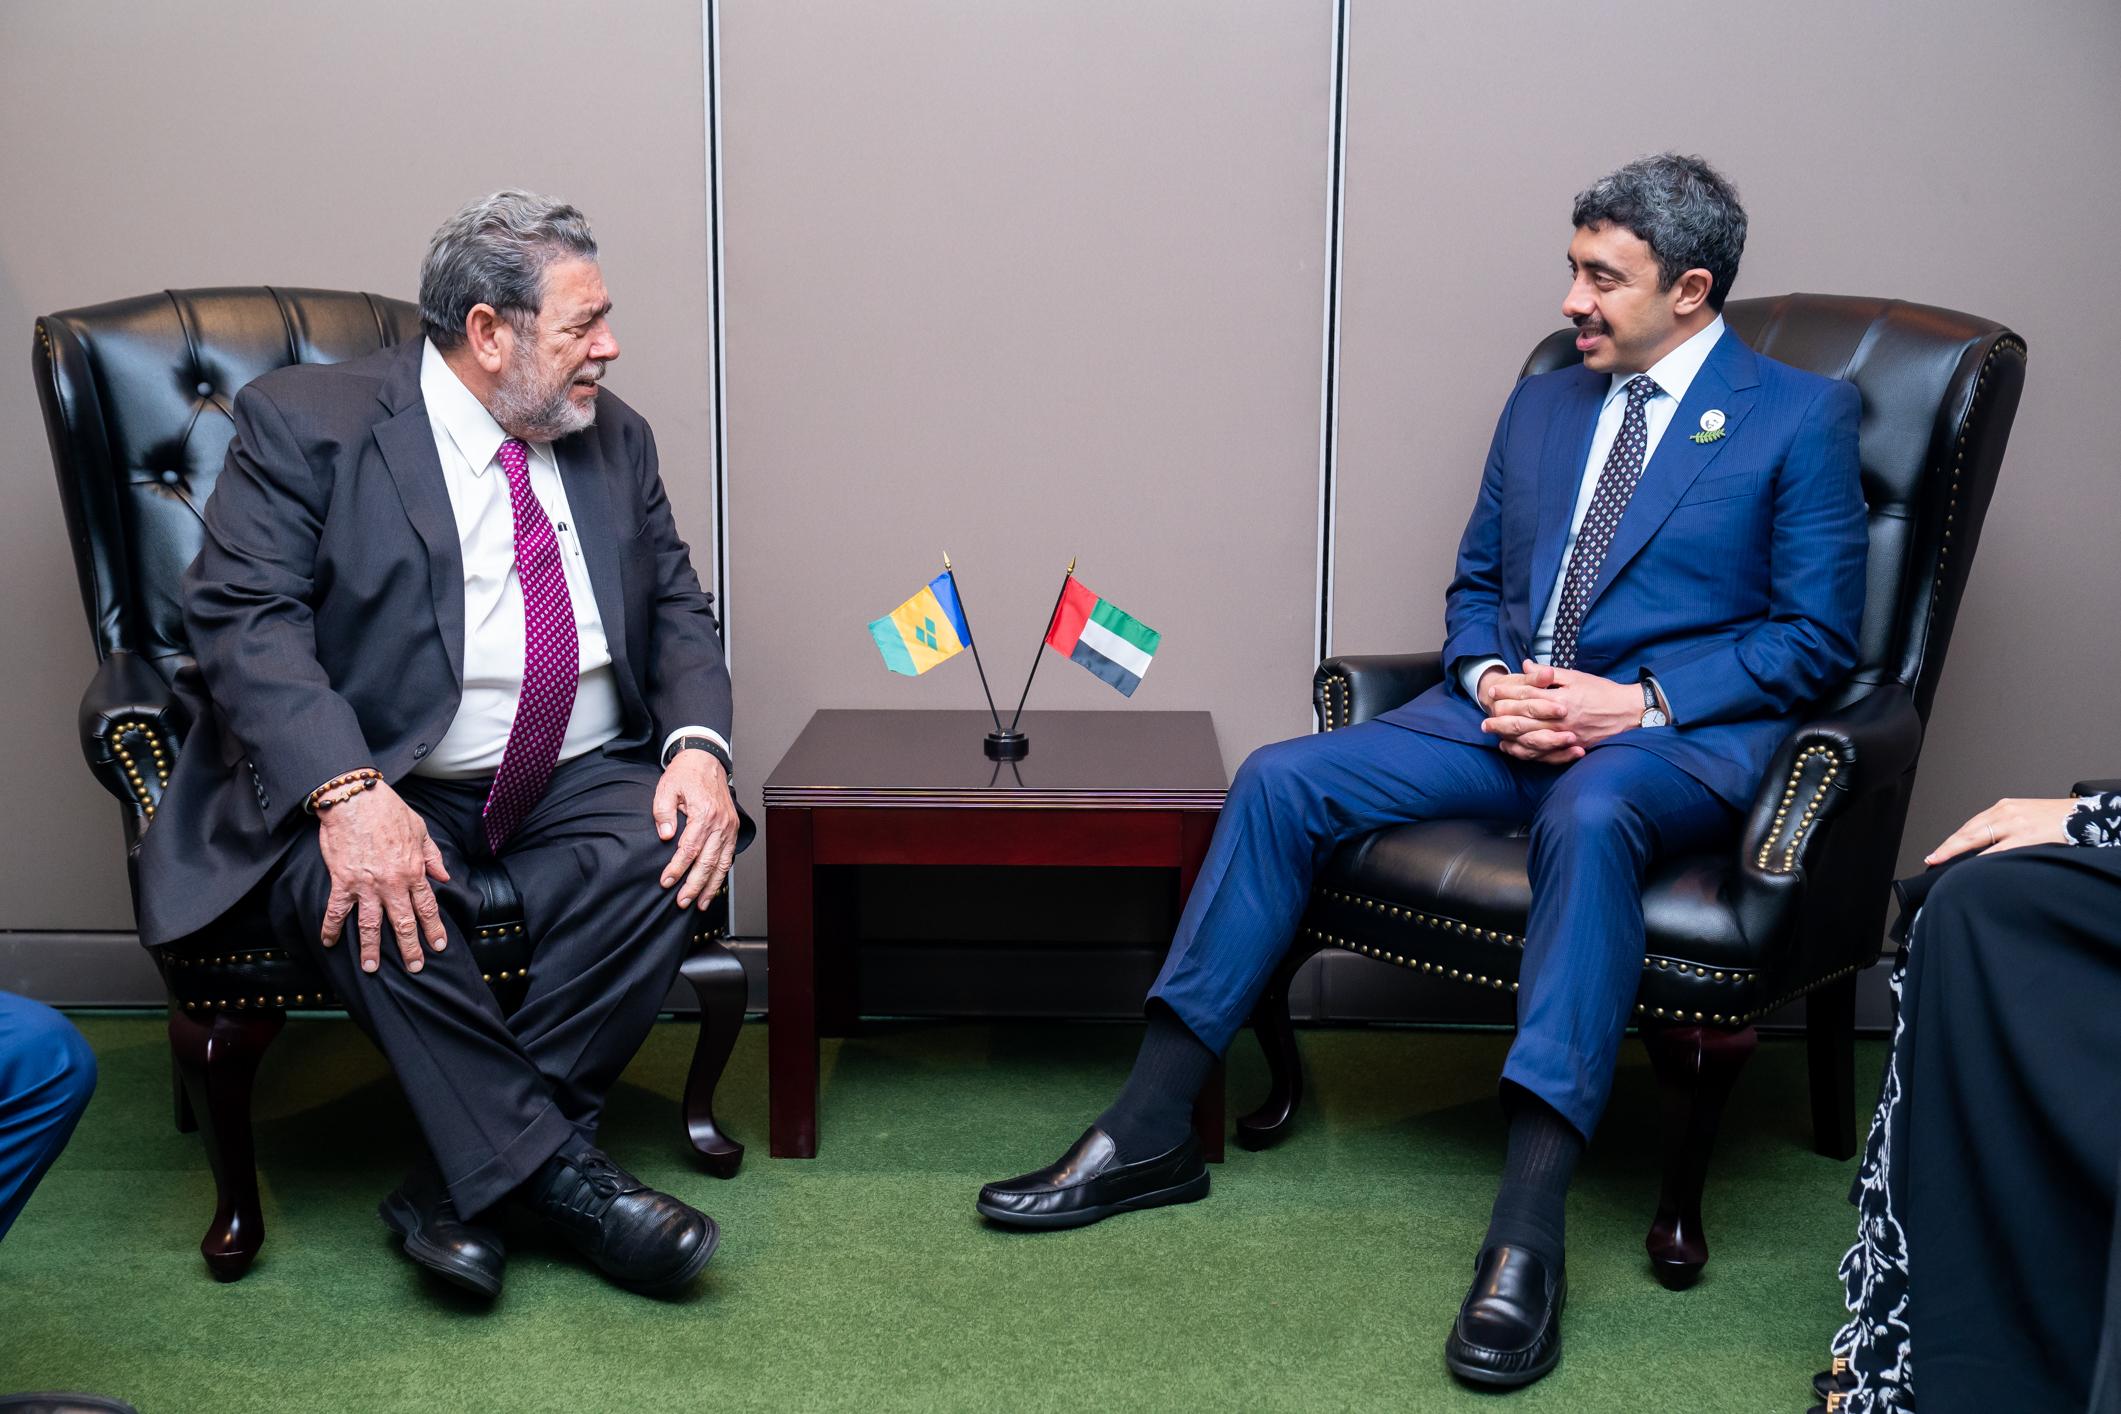 عبدالله بن زايد يلتقي رئيس وزراء سانت فنسنت وغرينادين